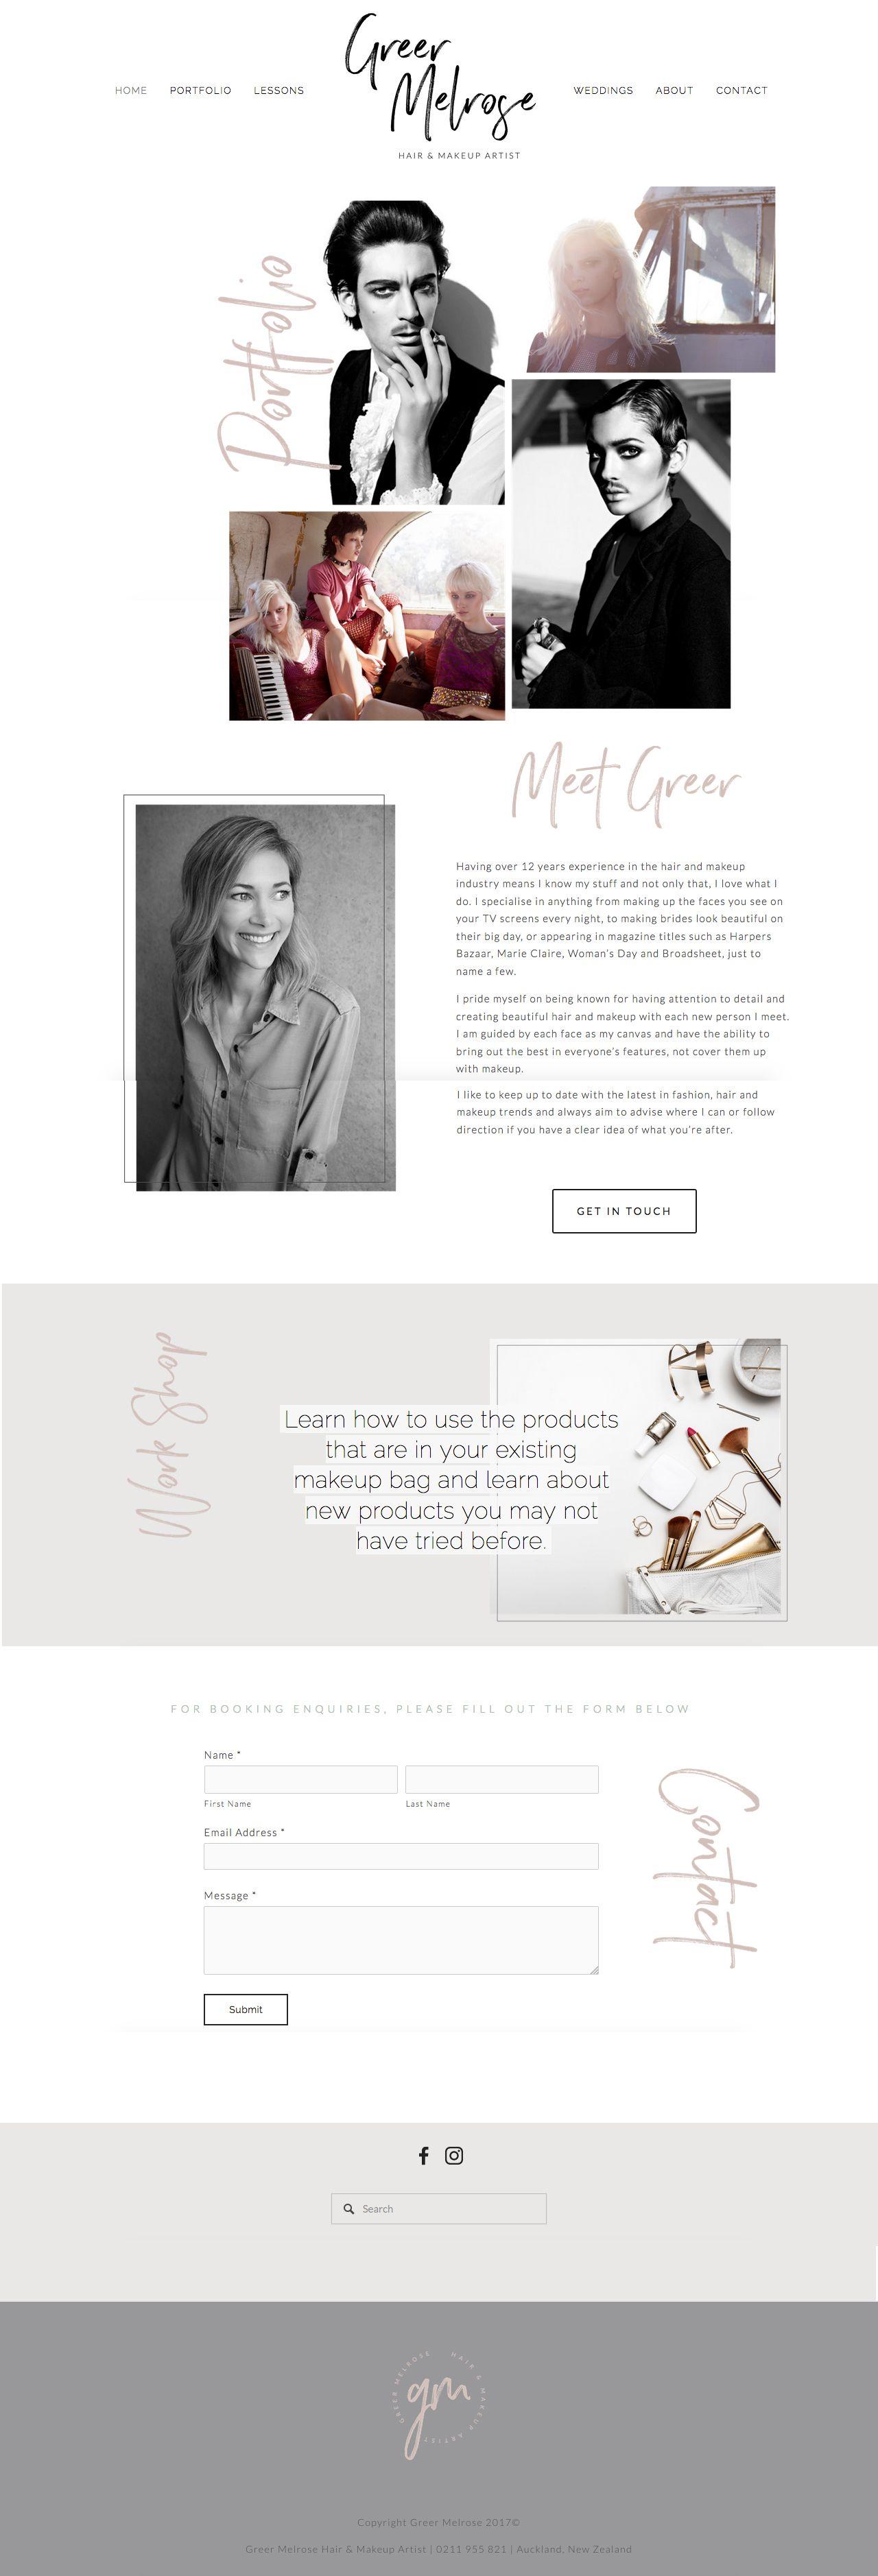 makeup artist resume%0A Squarespace webdesign by Polka Dot Heart Design   Makeup Artist Portfolio  Website   Branding  Brand